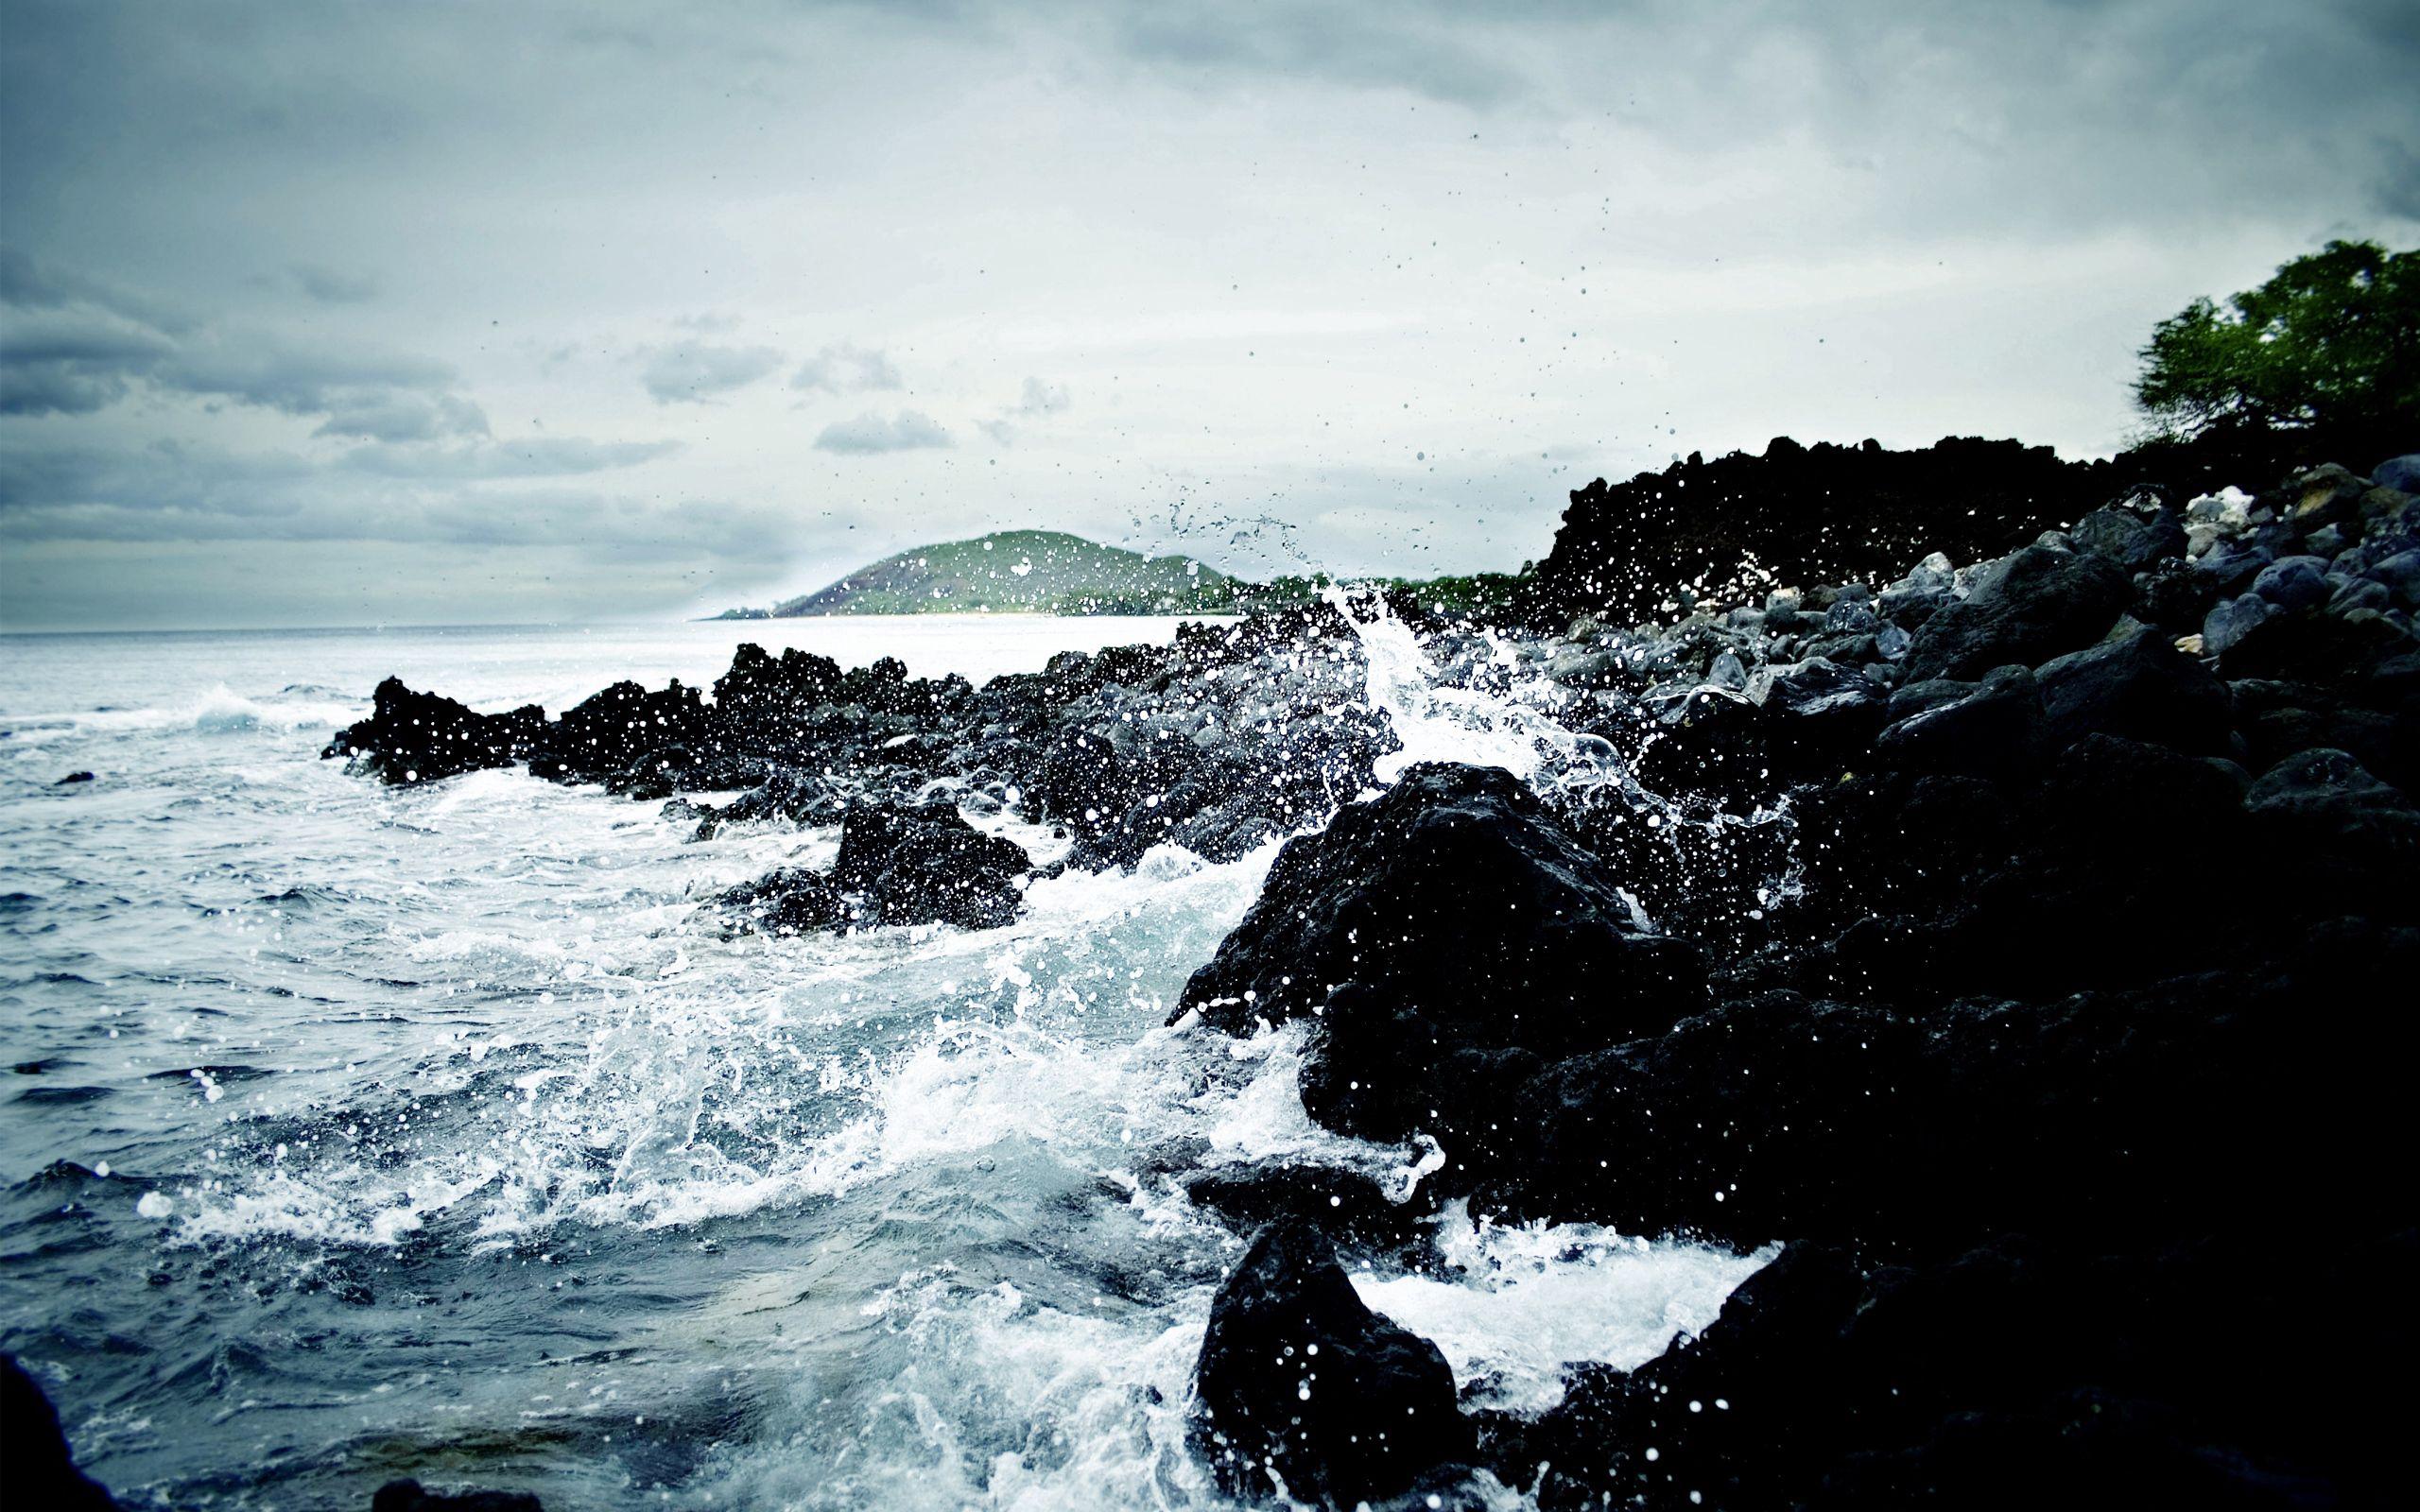 84781 скачать обои Природа, Океан, Камни, Вода, Шторм, Холод, Брызги - заставки и картинки бесплатно